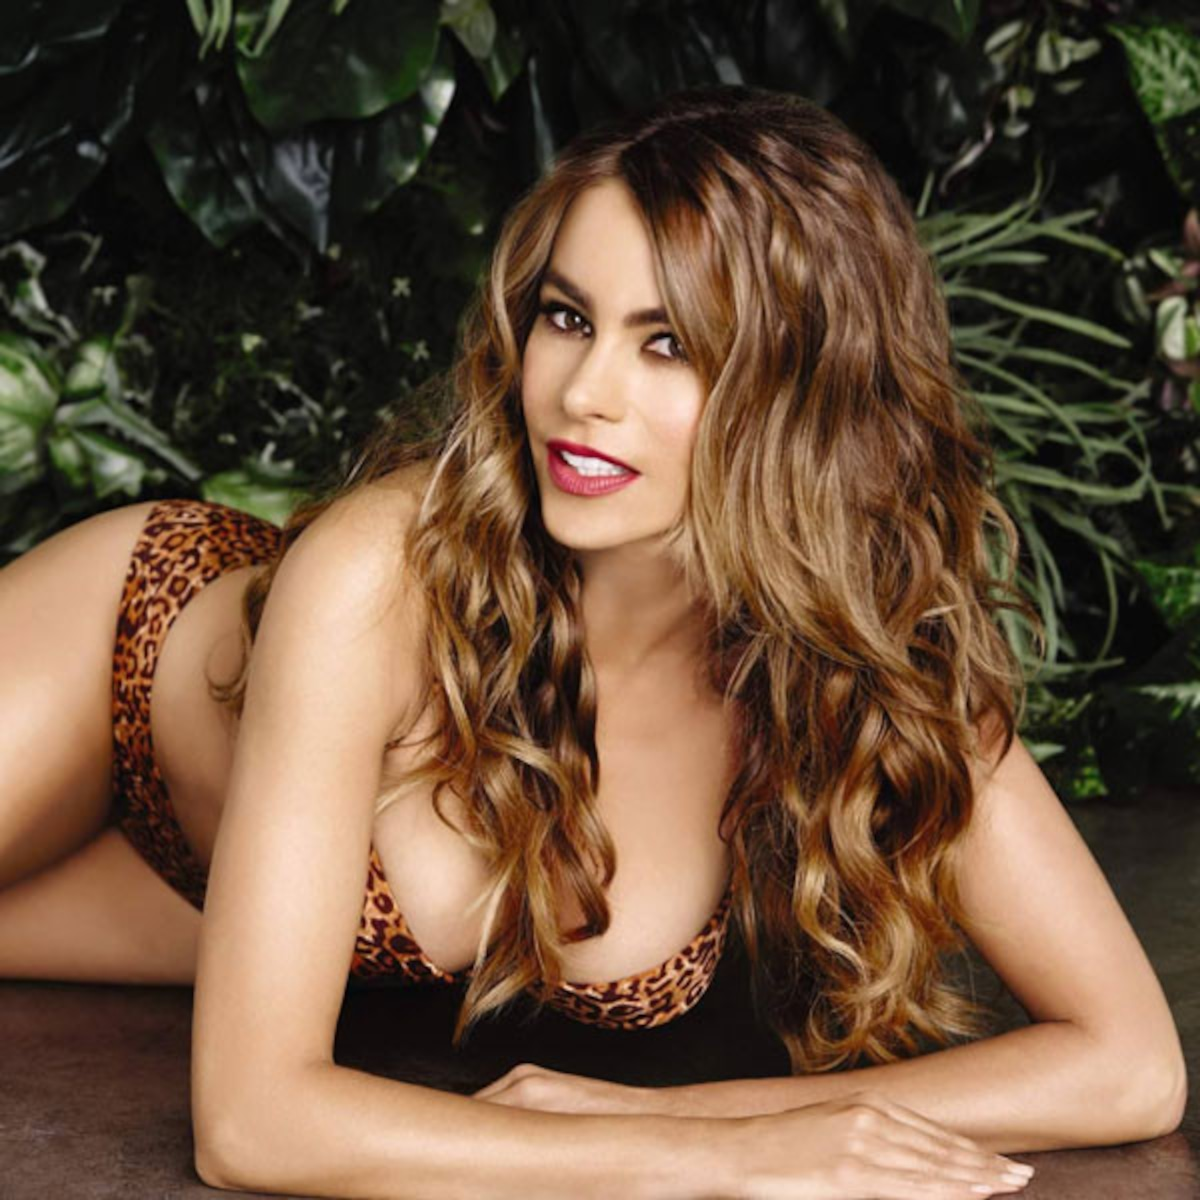 Hot girl in bikini on modern family Check Out B Day Girl Sofia Vergara S Hottest Bikini Pics E Online